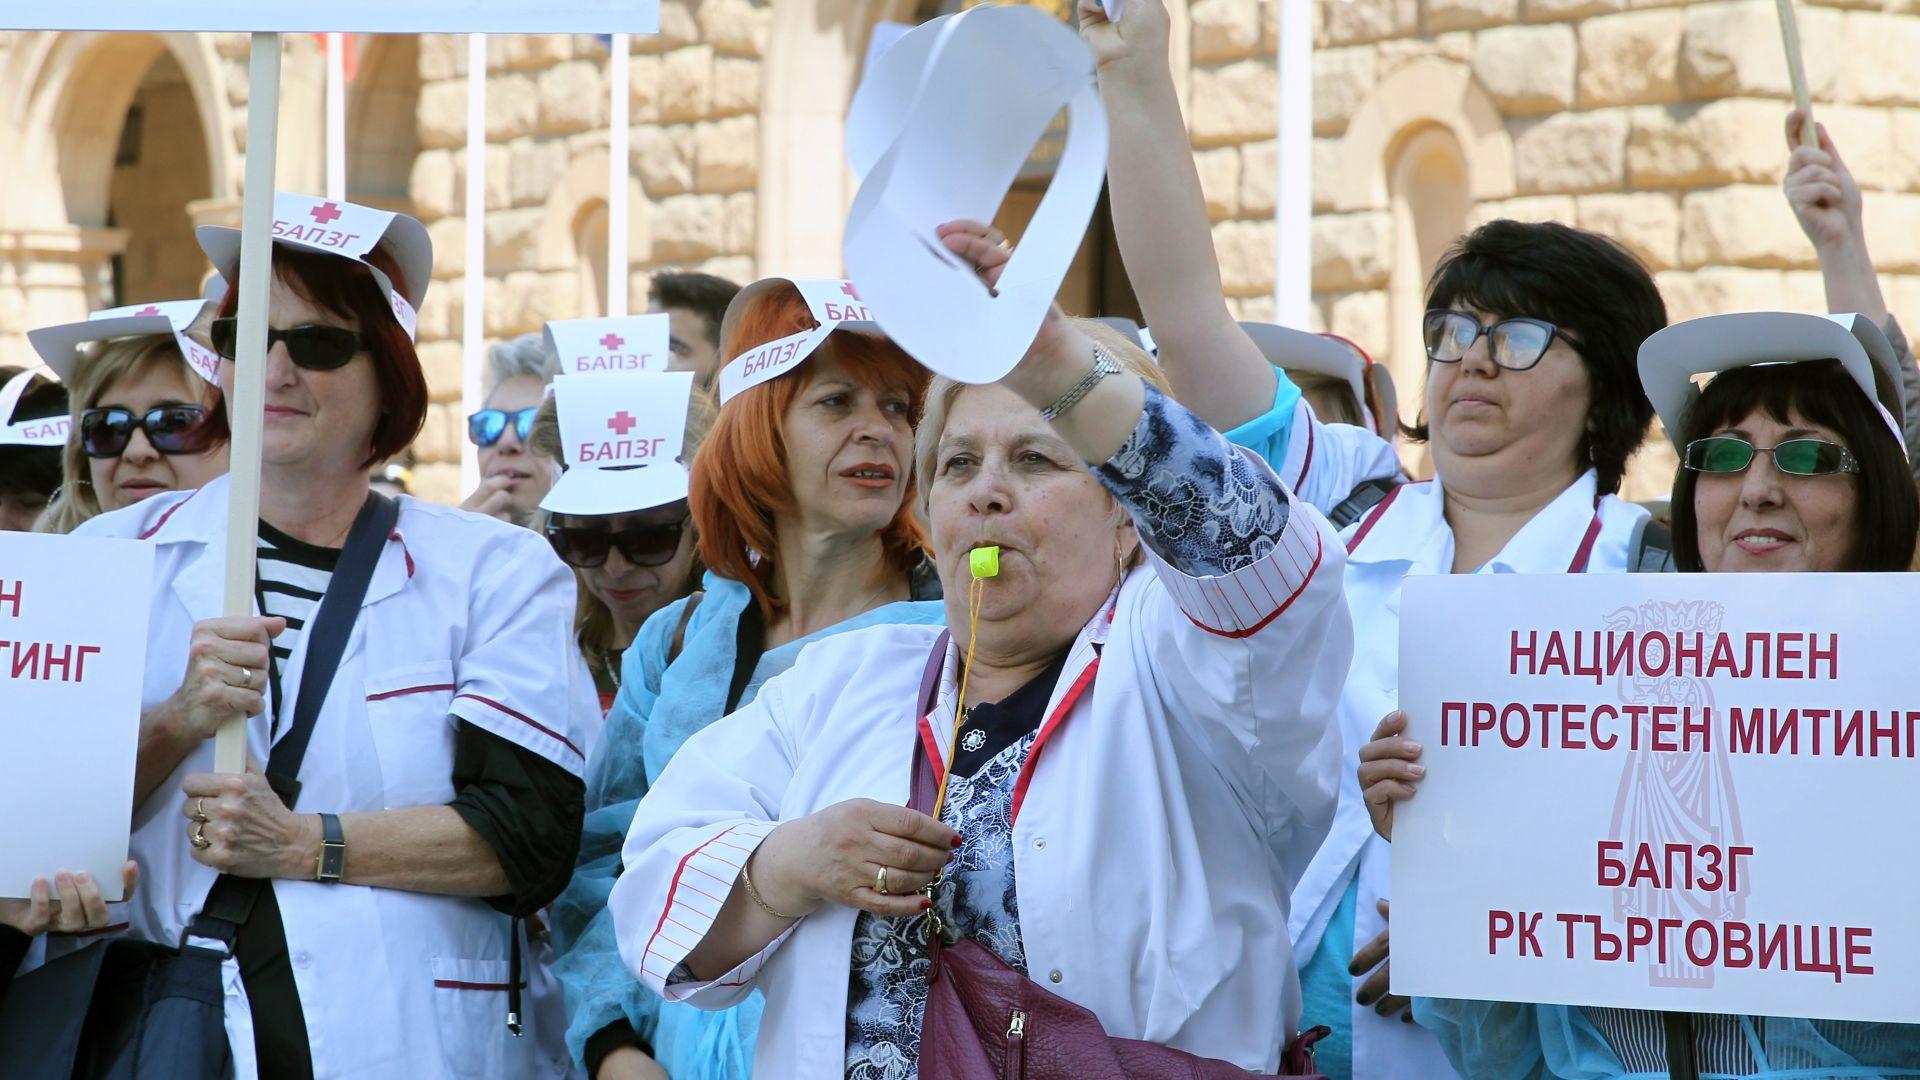 Стотици медсестри под прозорците на властта: Днес на протест, утре стачка